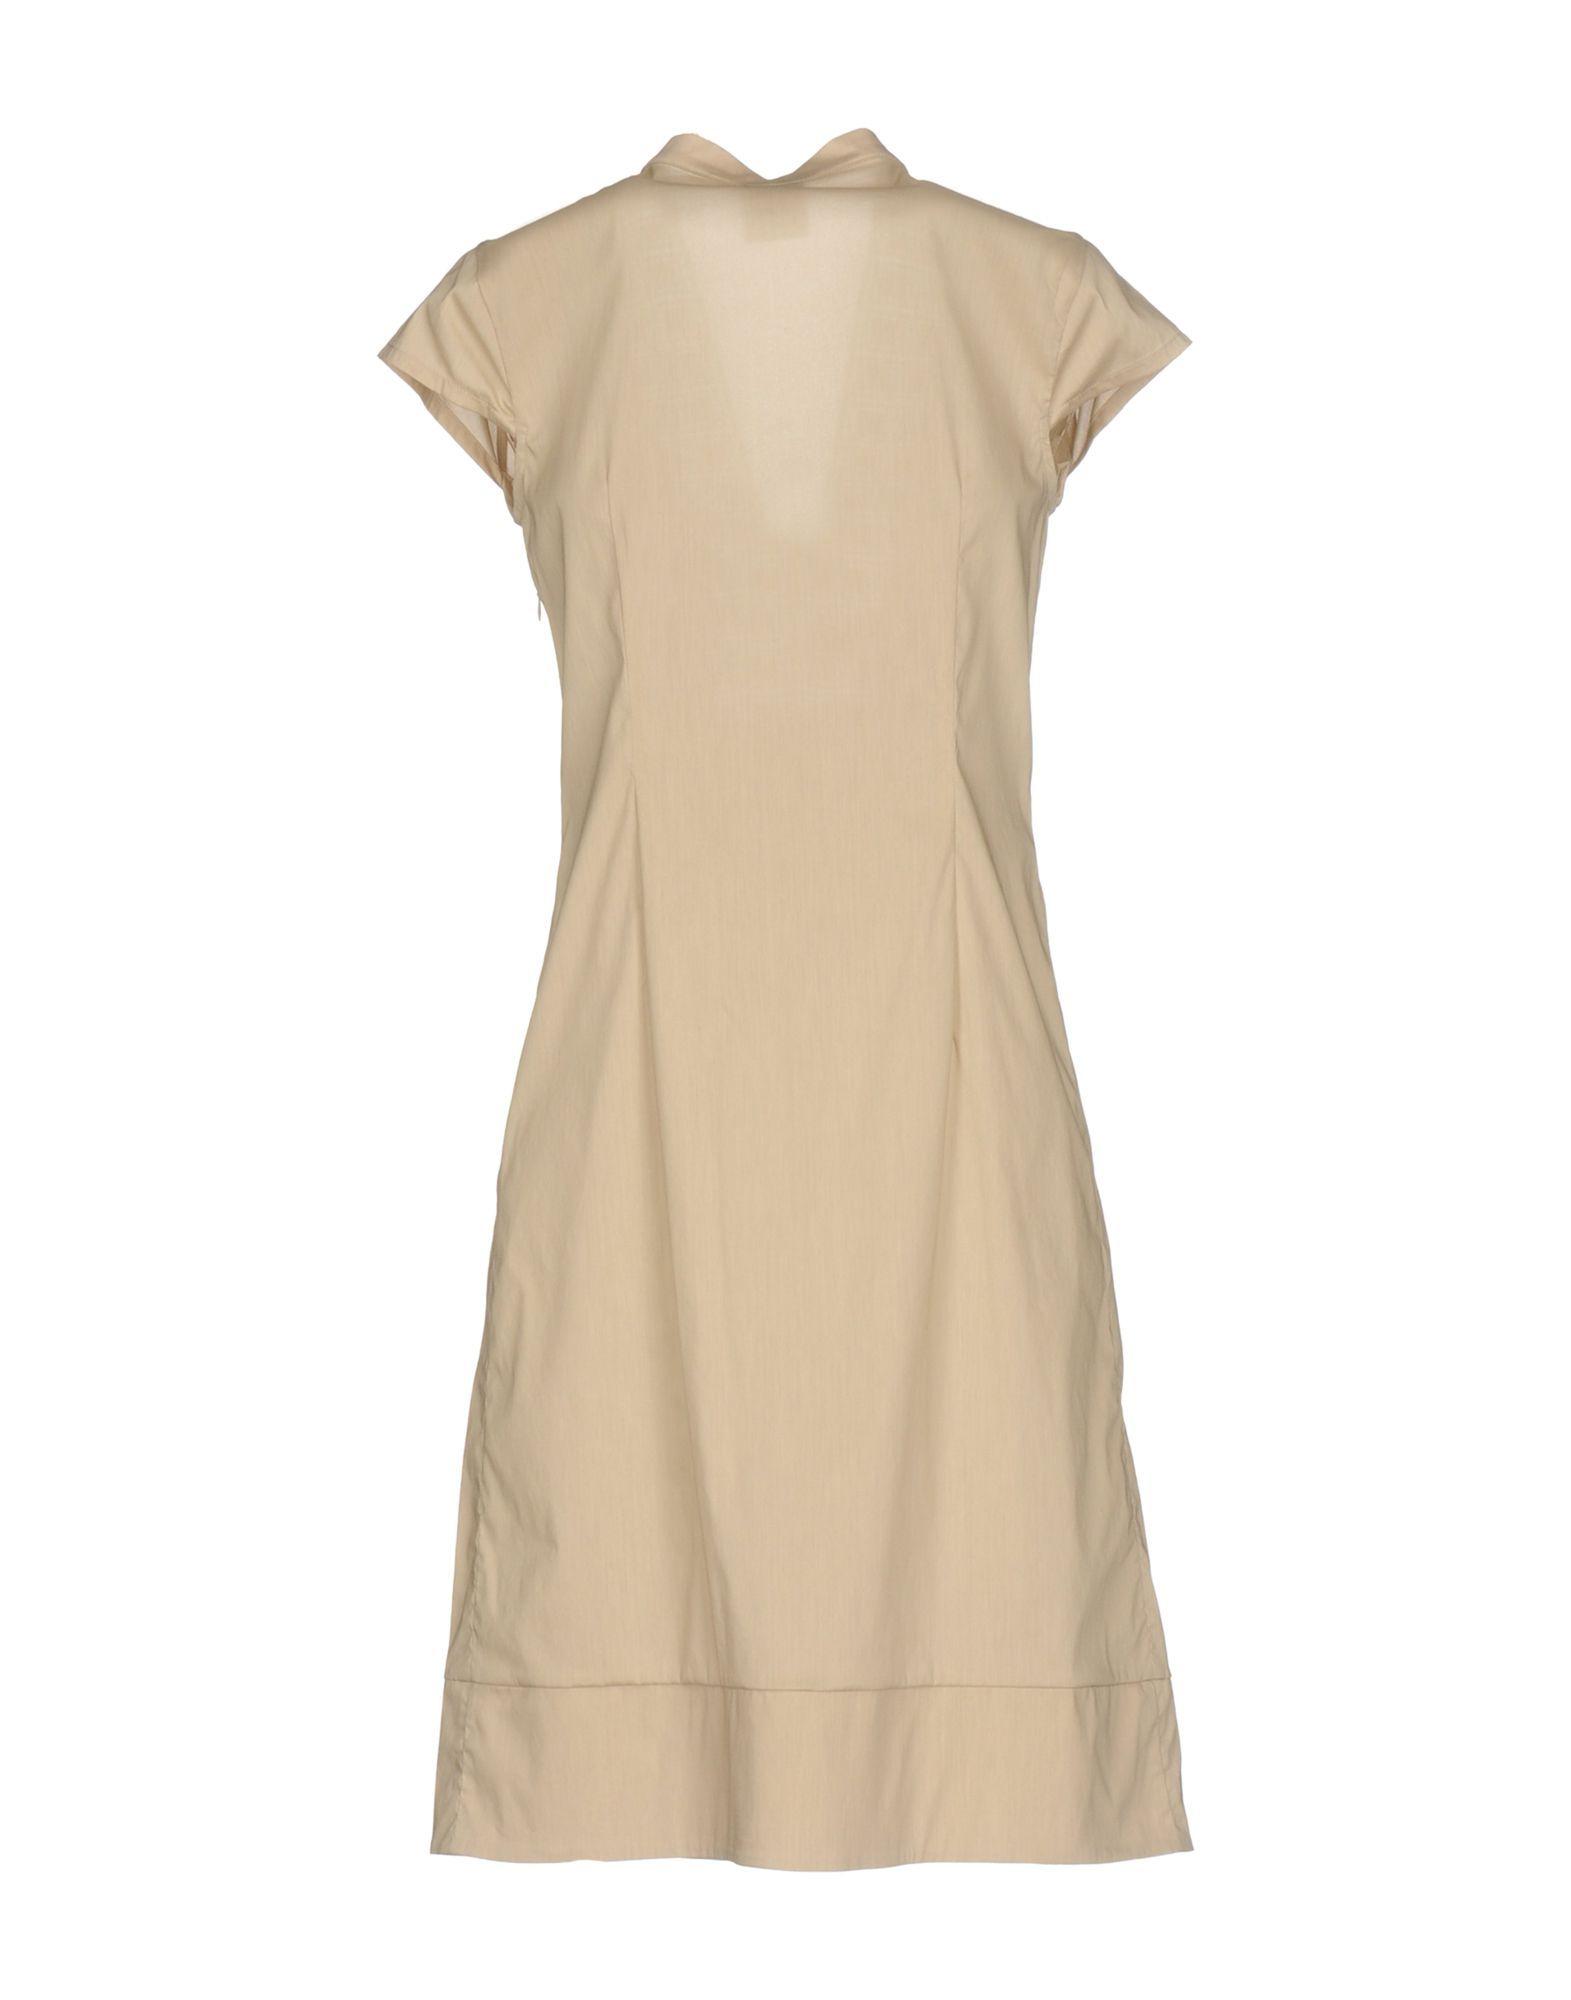 Pf Paola Frani Beige Cotton Short Sleeve Dress